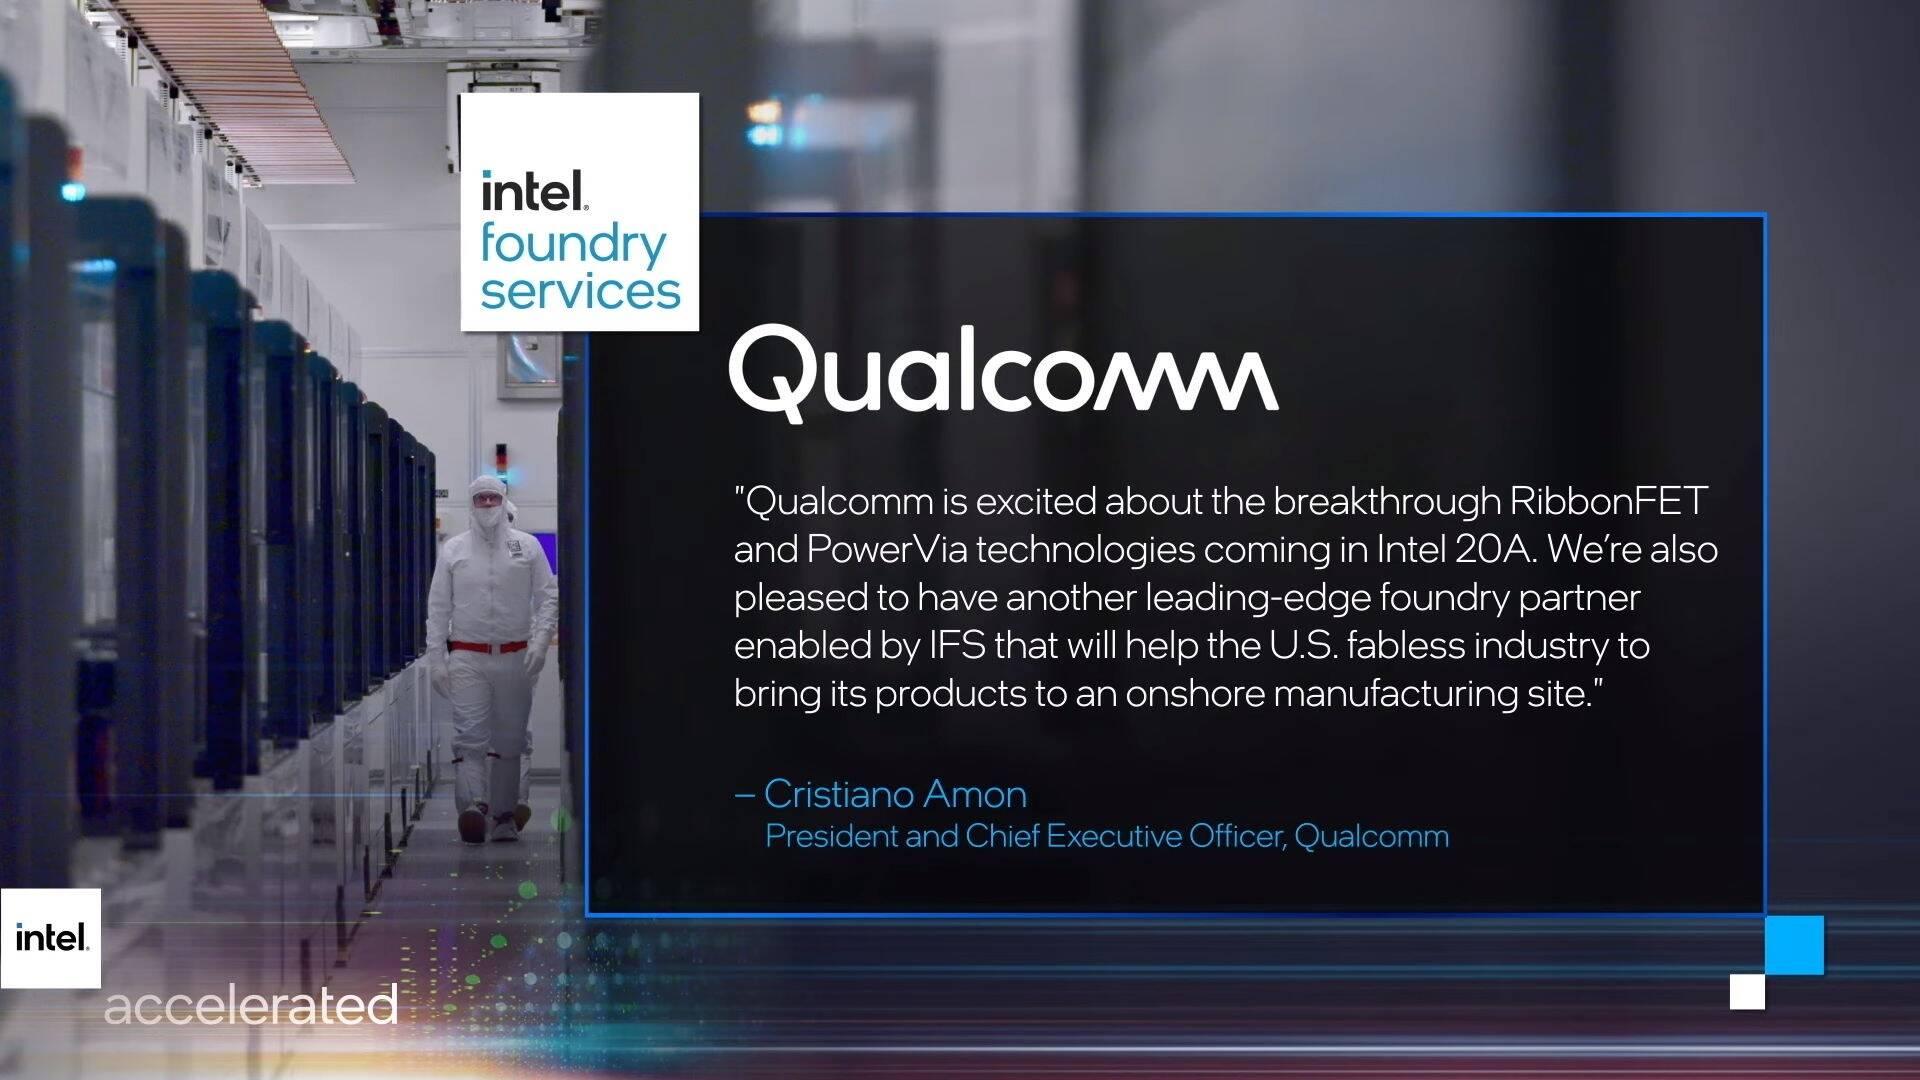 Intel + Qualcomm